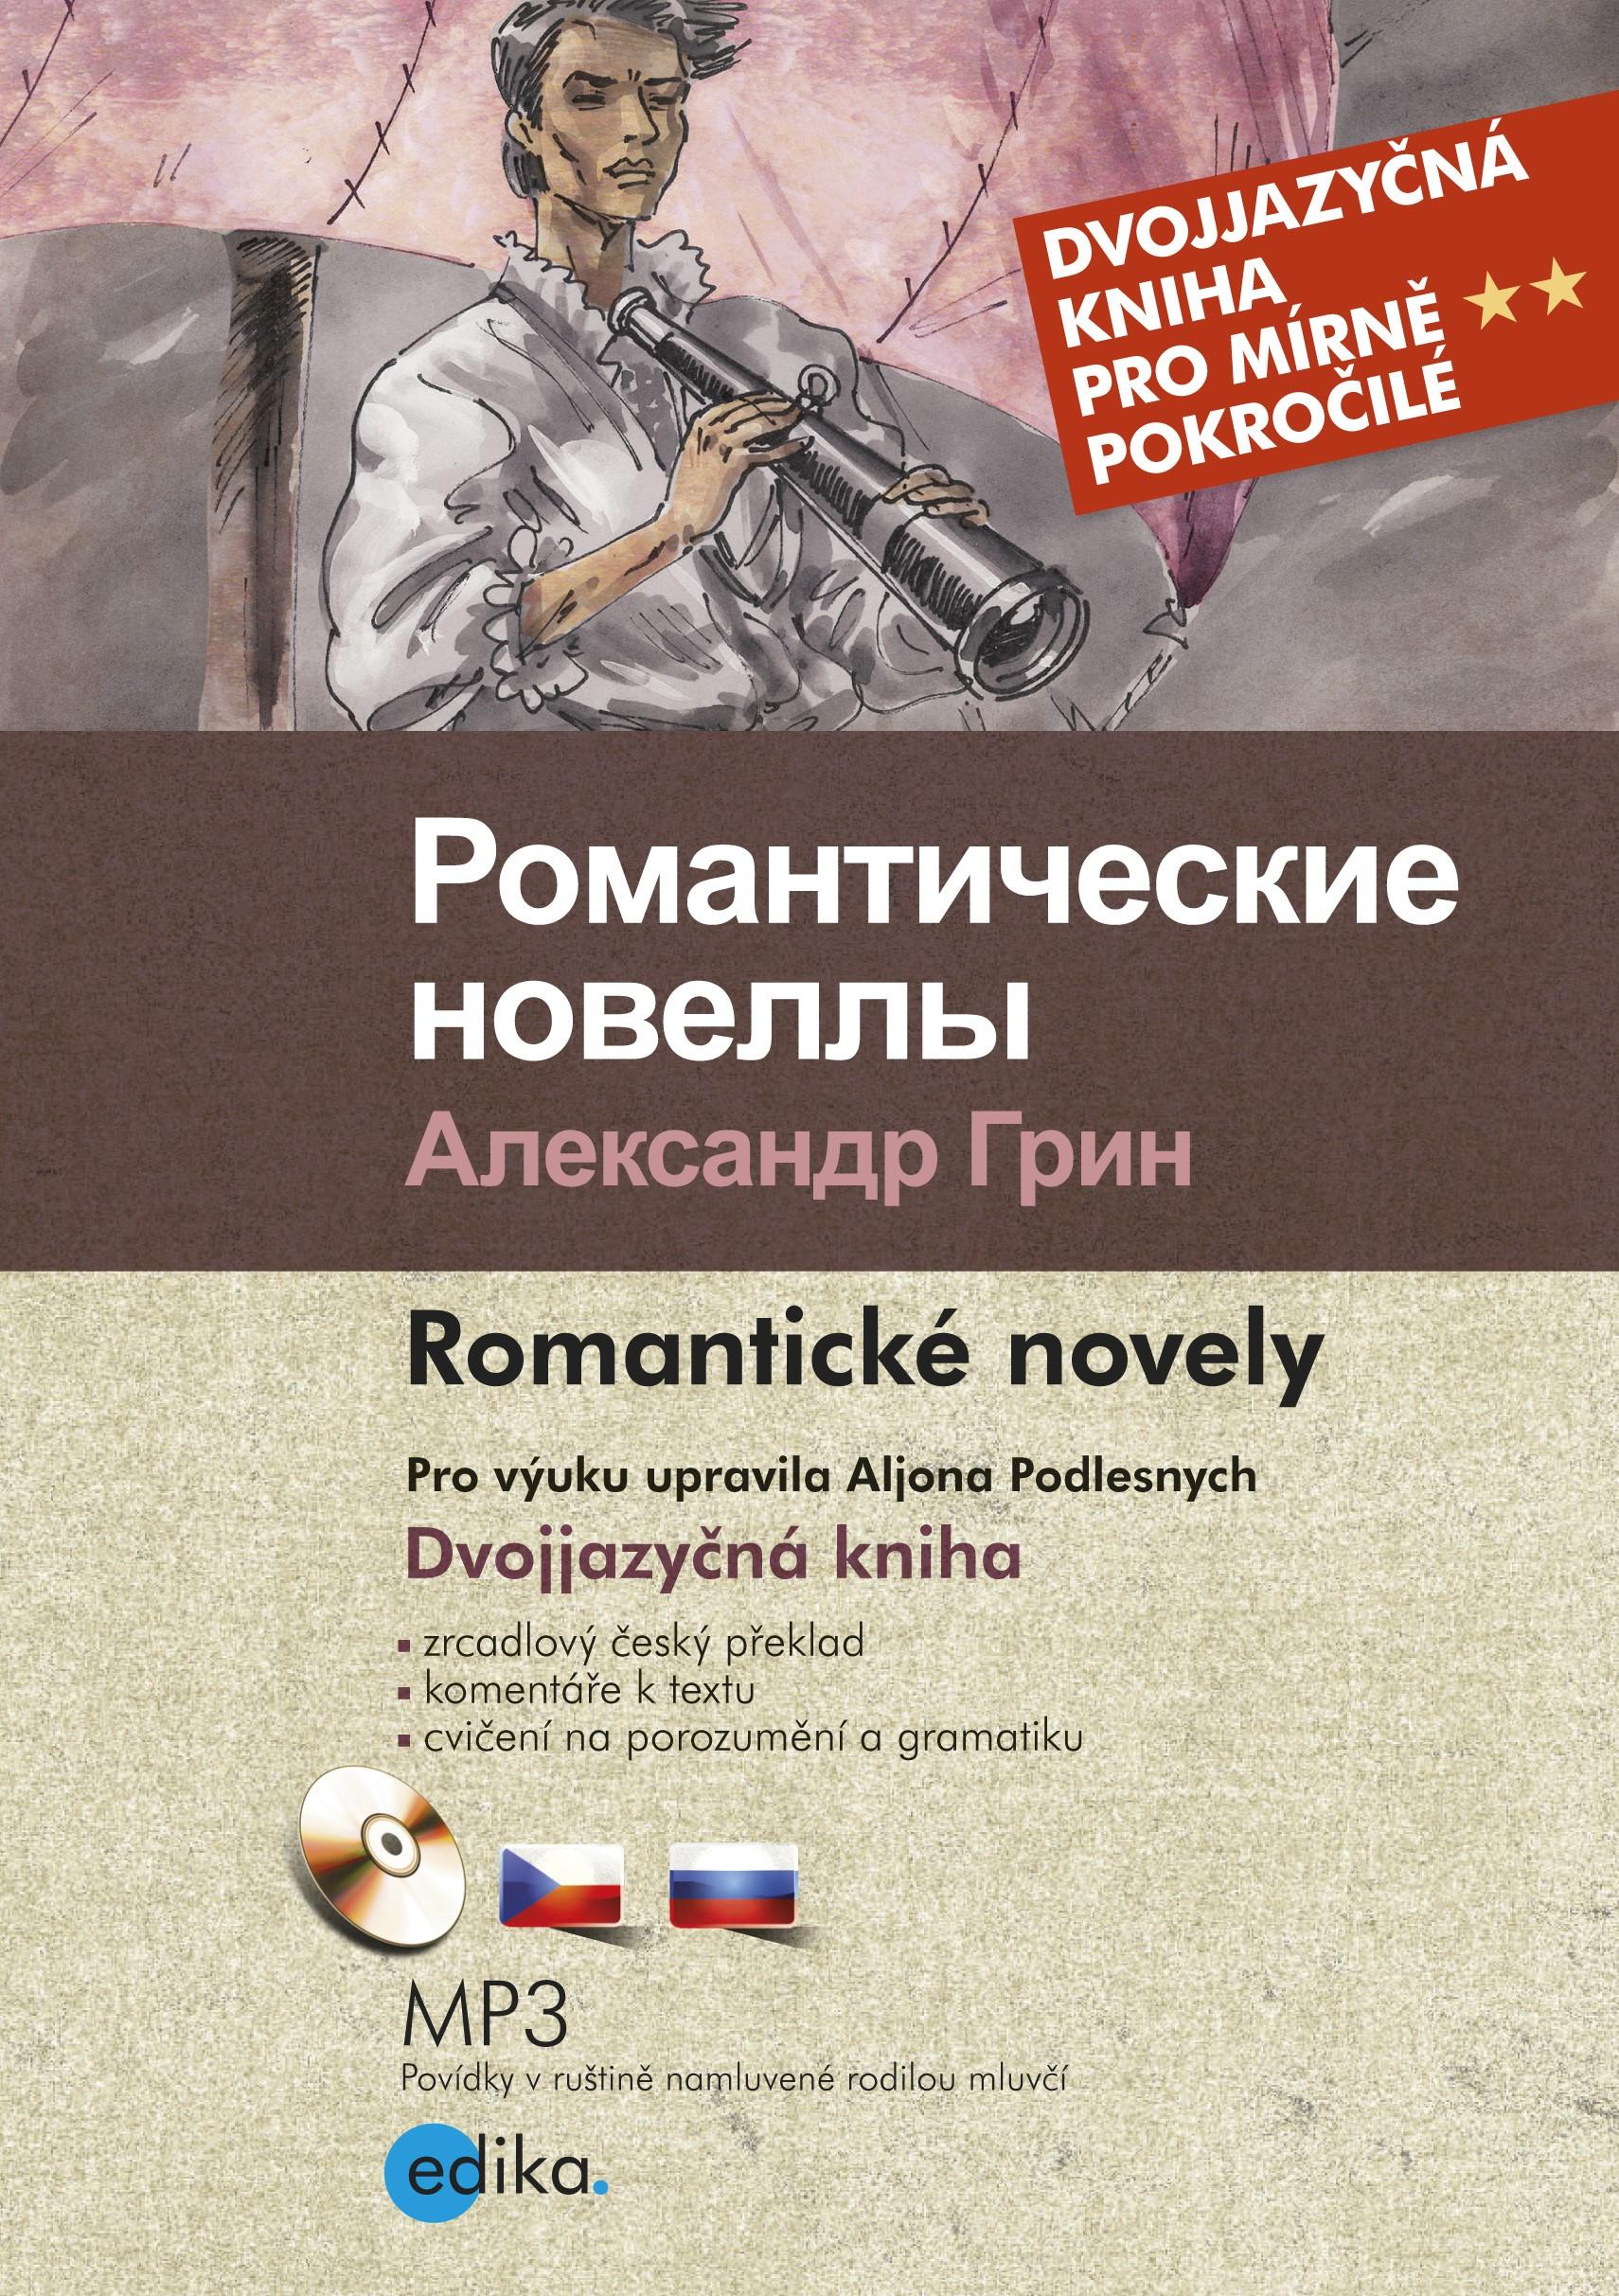 Romantické novely | Alexandr Grin